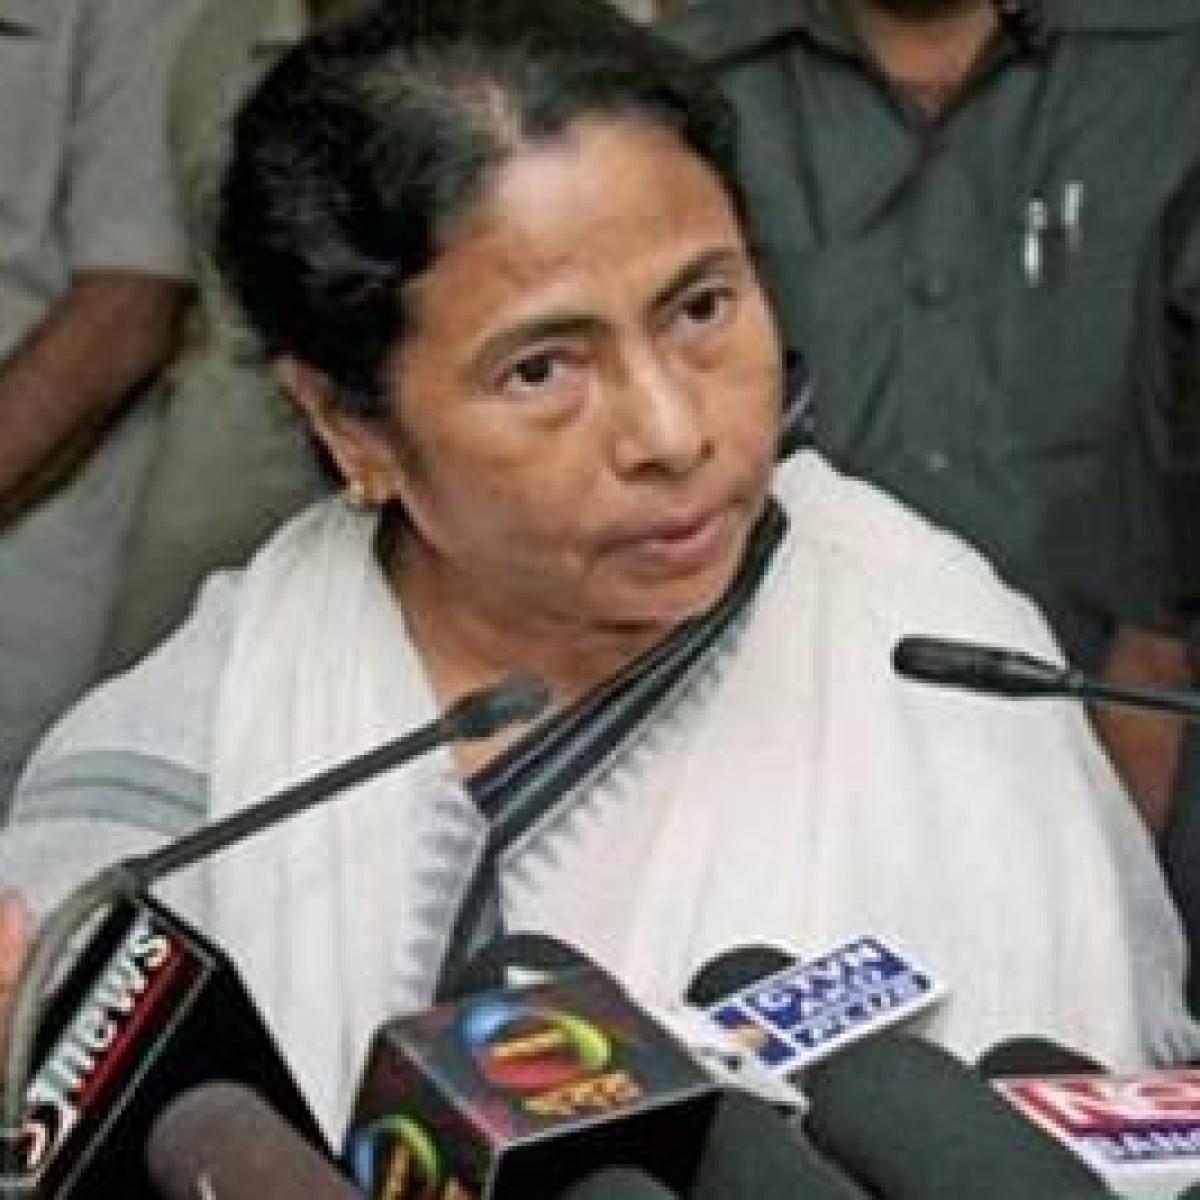 Democracy is missing: Mamata Banerjee after Chidambaram's arrest